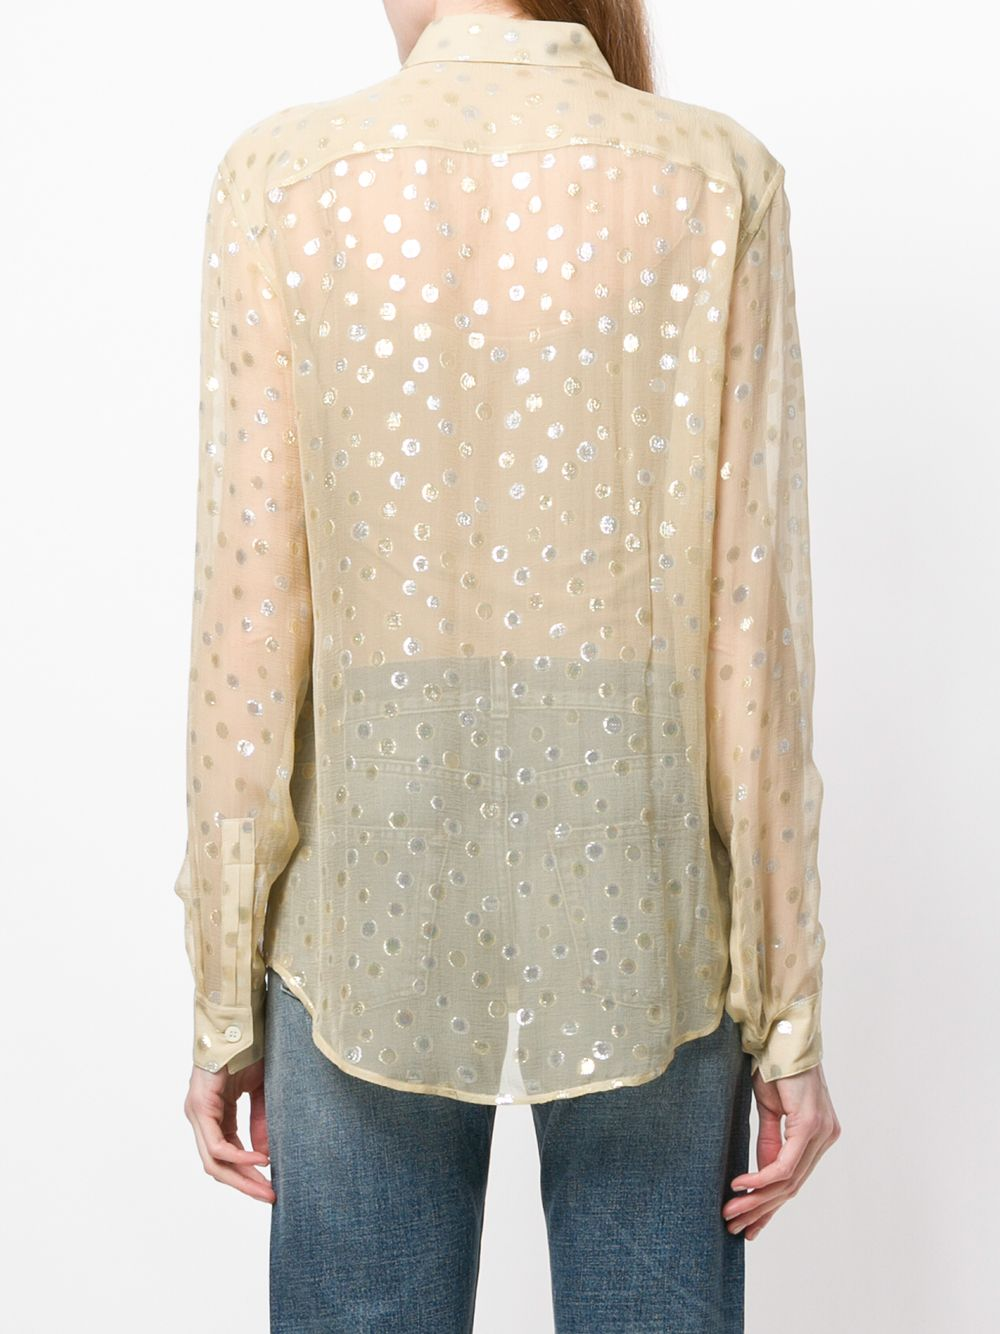 SAINT LAURENT | рубашка из жоржета с узором в горох | Clouty